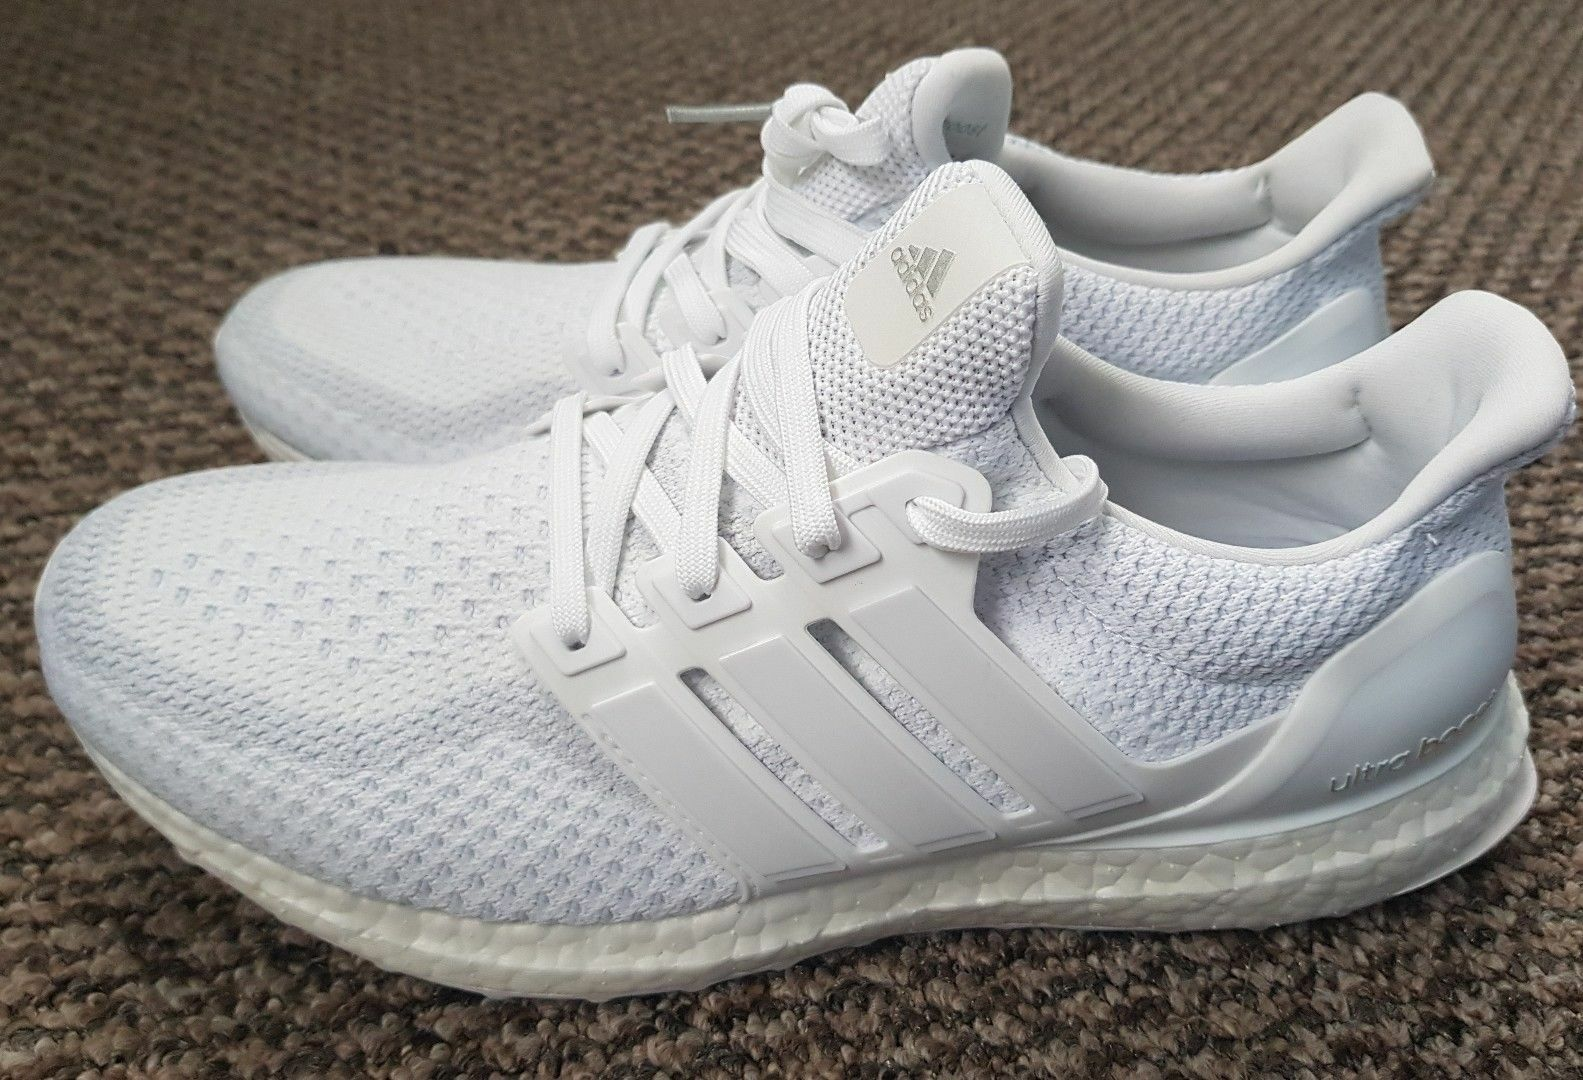 Adidas Ultra Boost 2.0 blancoo AQ5929 Zapatillas Tamaño 9